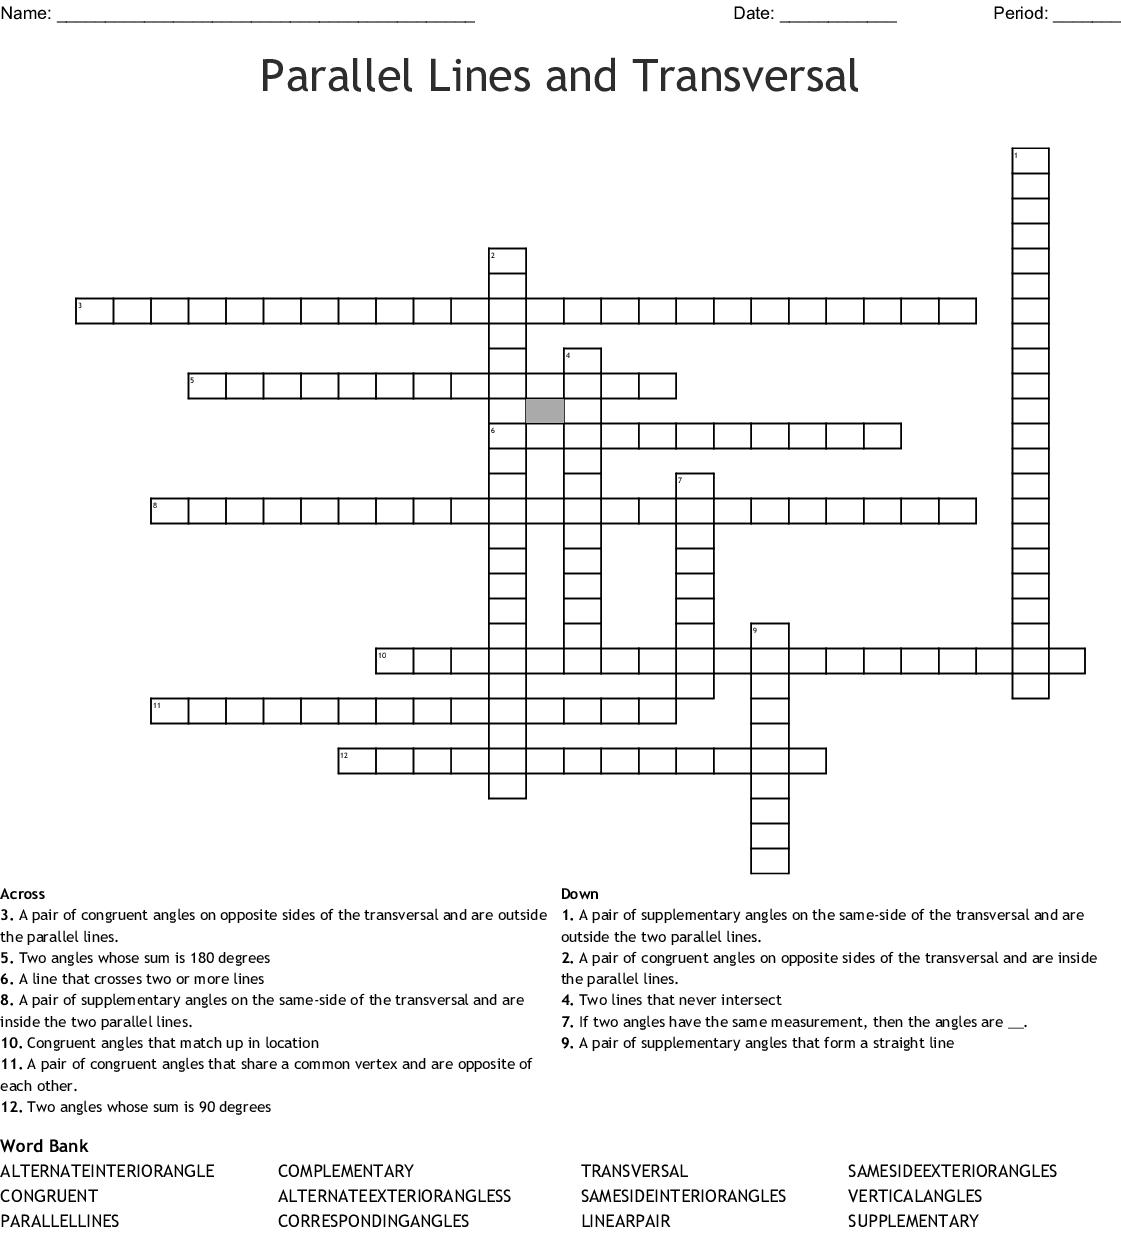 Parallel Lines And Transversal Crossword Word